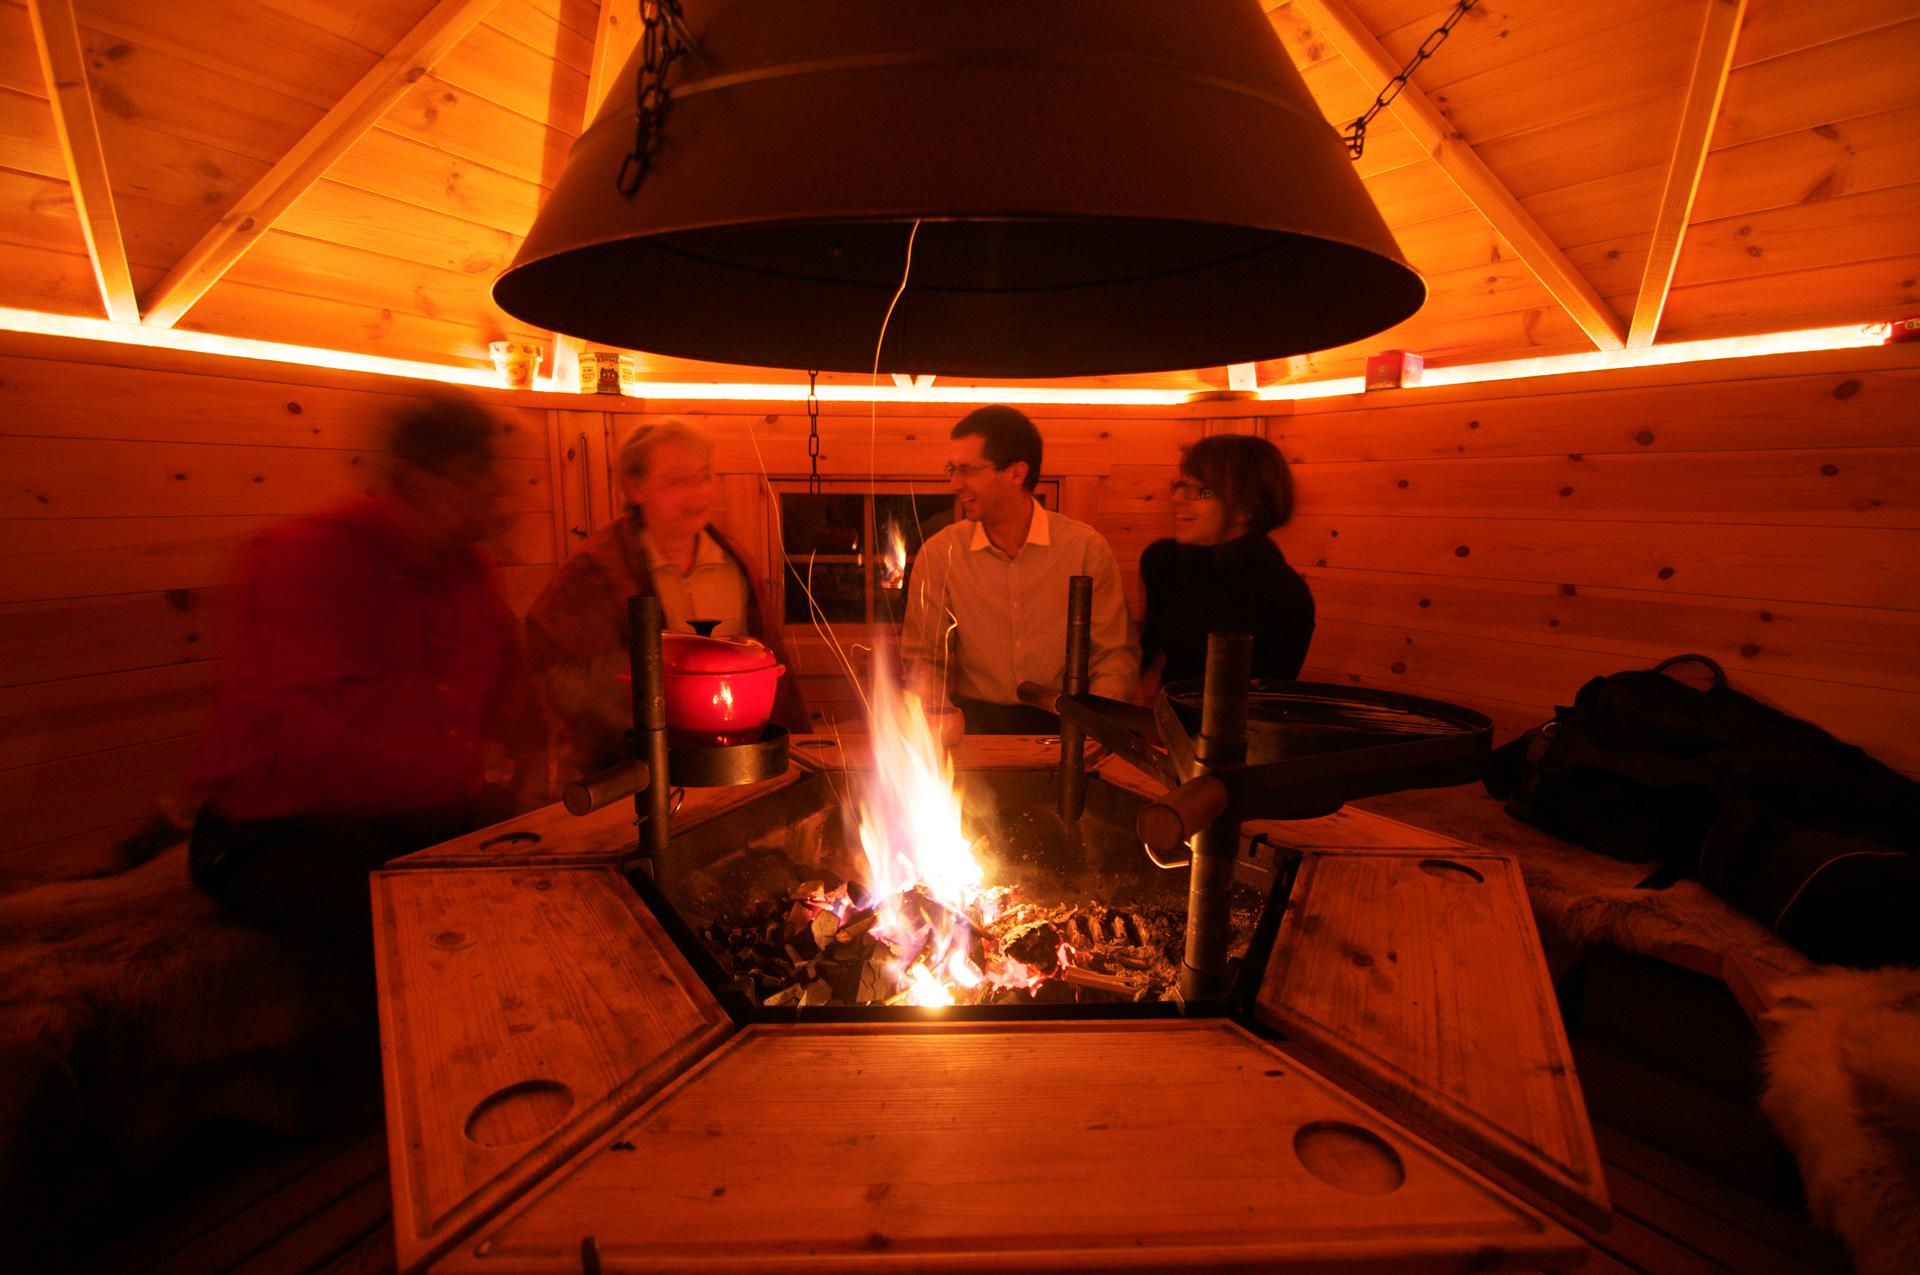 soiree-grillades-chalet-grill-finlandais